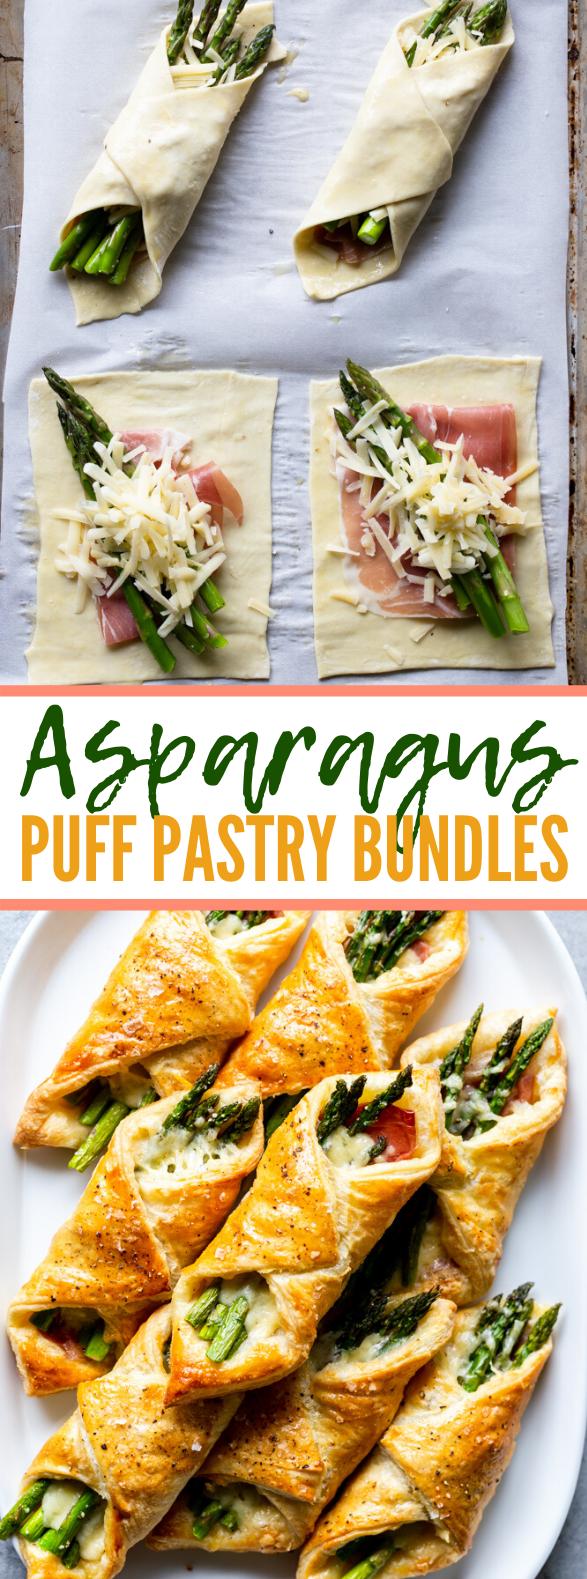 PROSCIUTTO ASPARAGUS PUFF PASTRY BUNDLES #appetizers #brunch